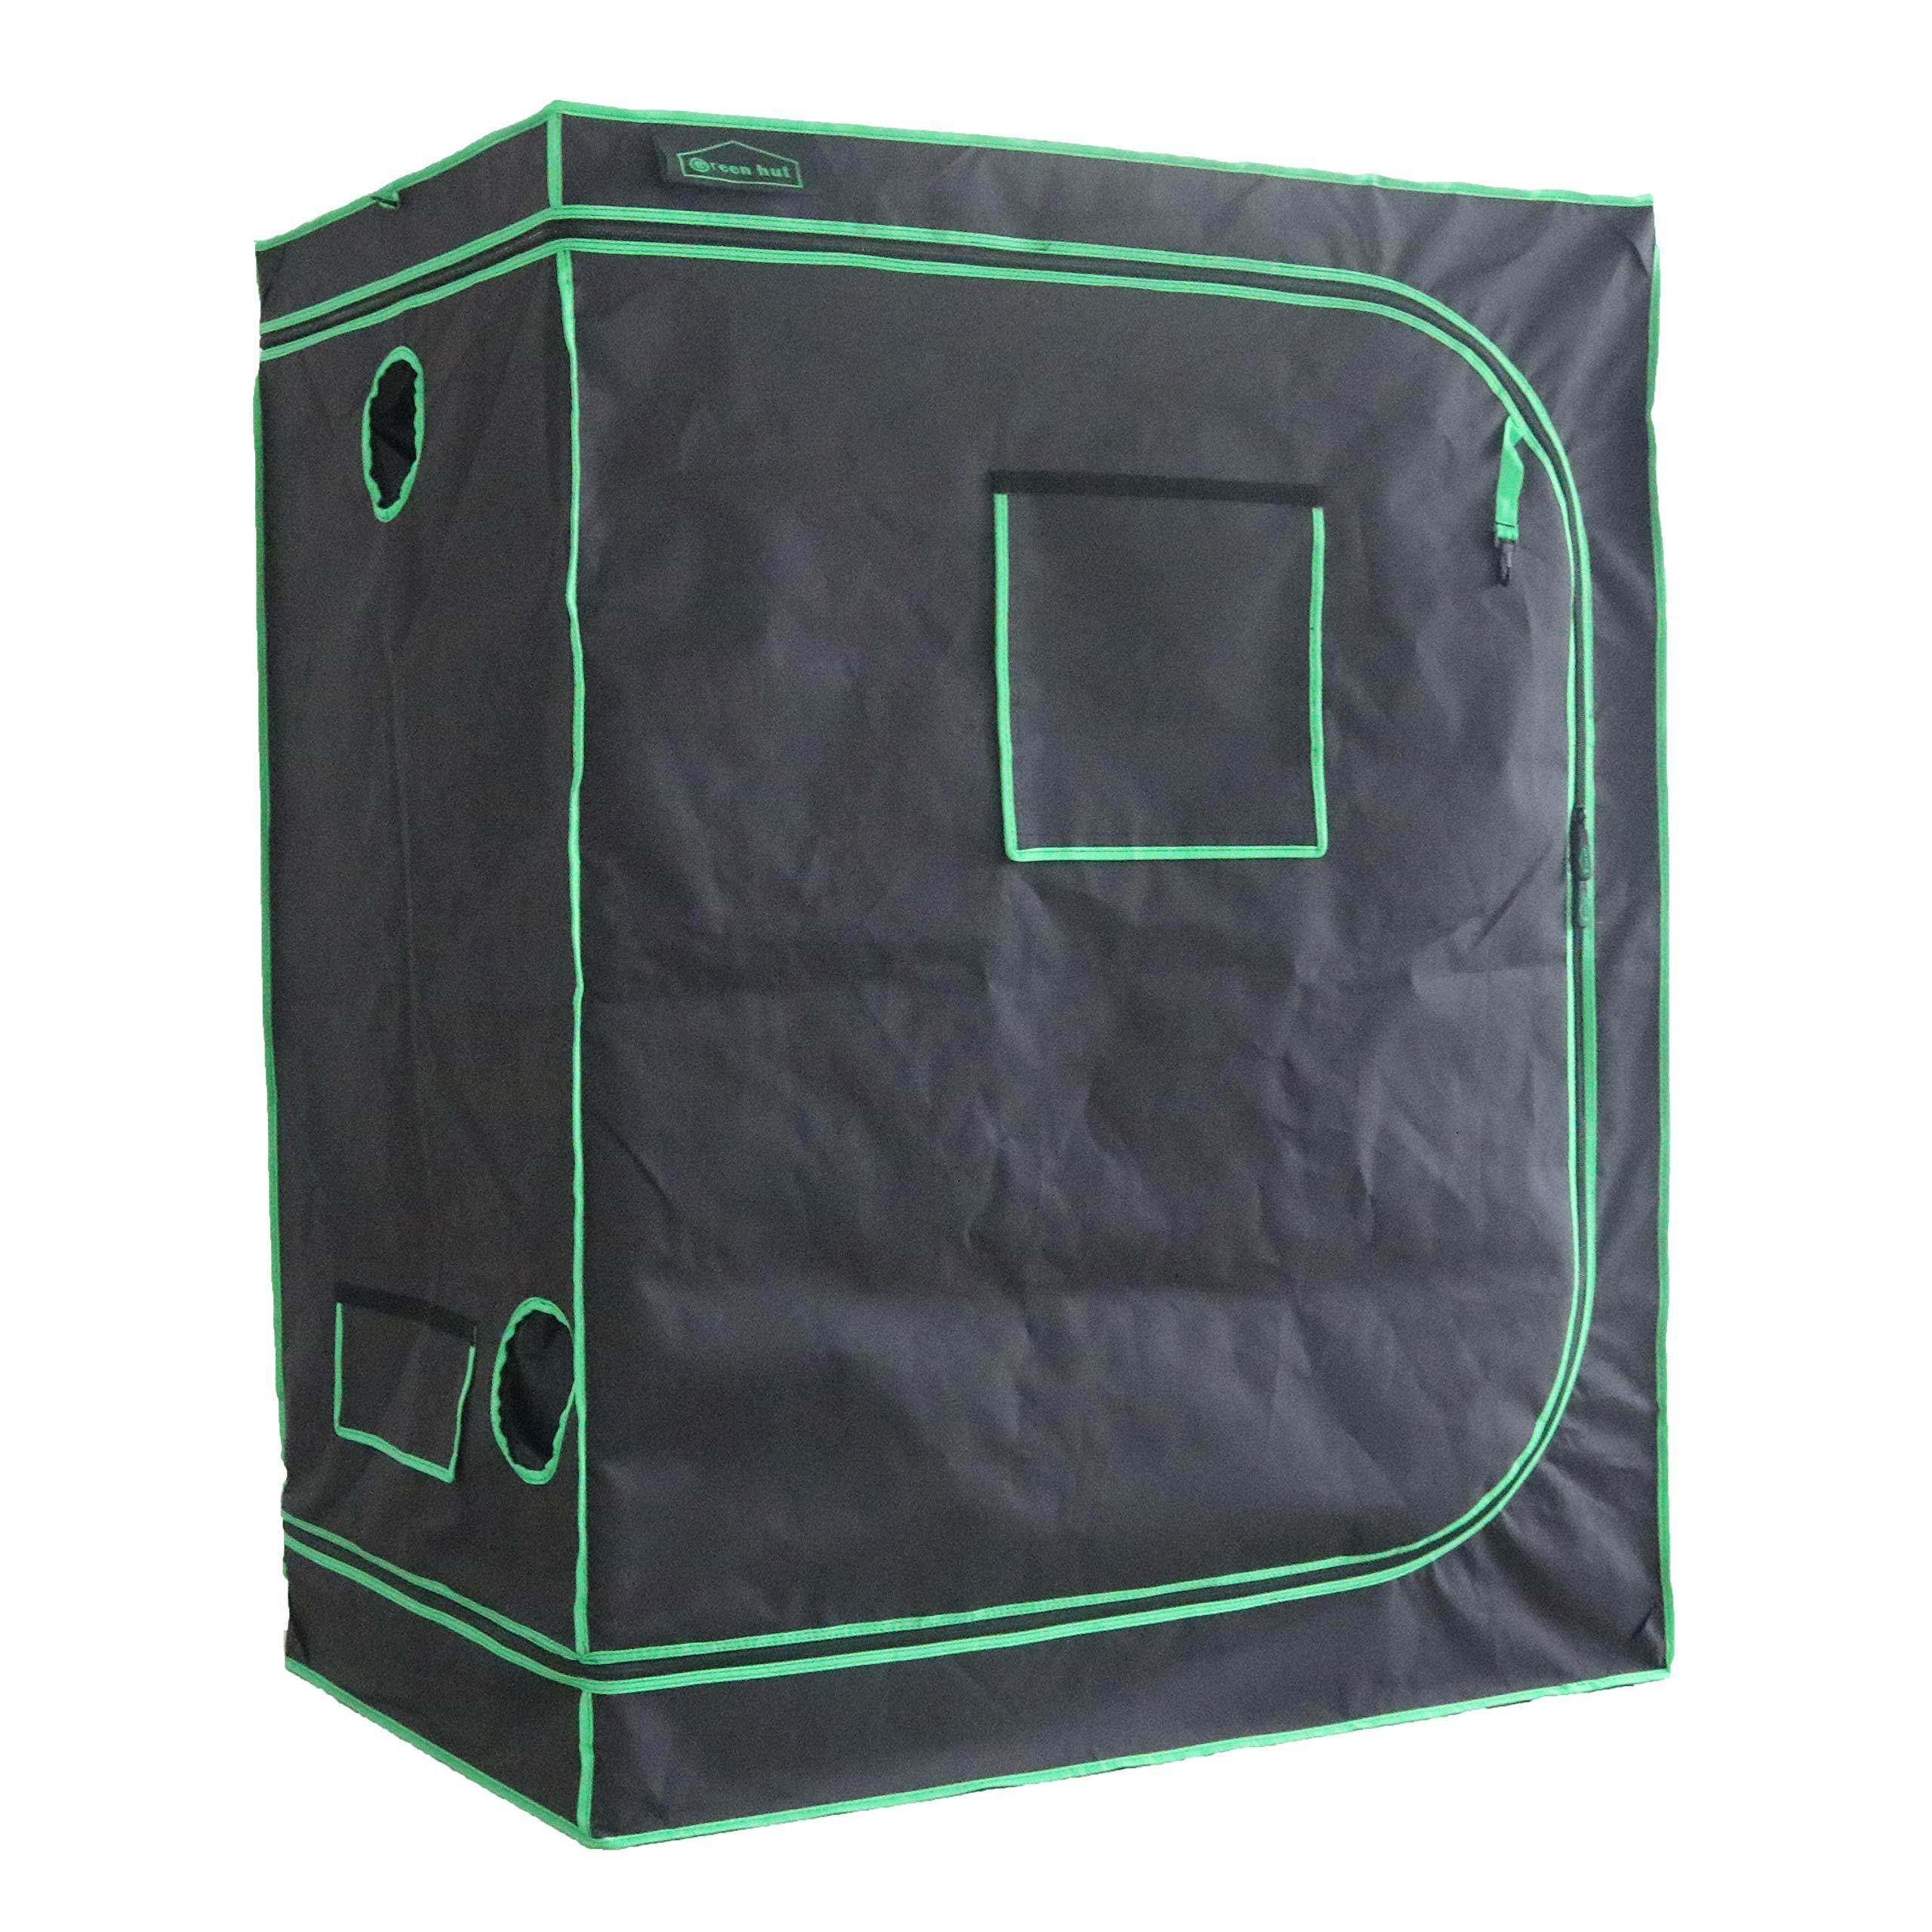 Green Hut 48''X32''X60'' 600D Mylar Hydroponic Indoor Grow Tent